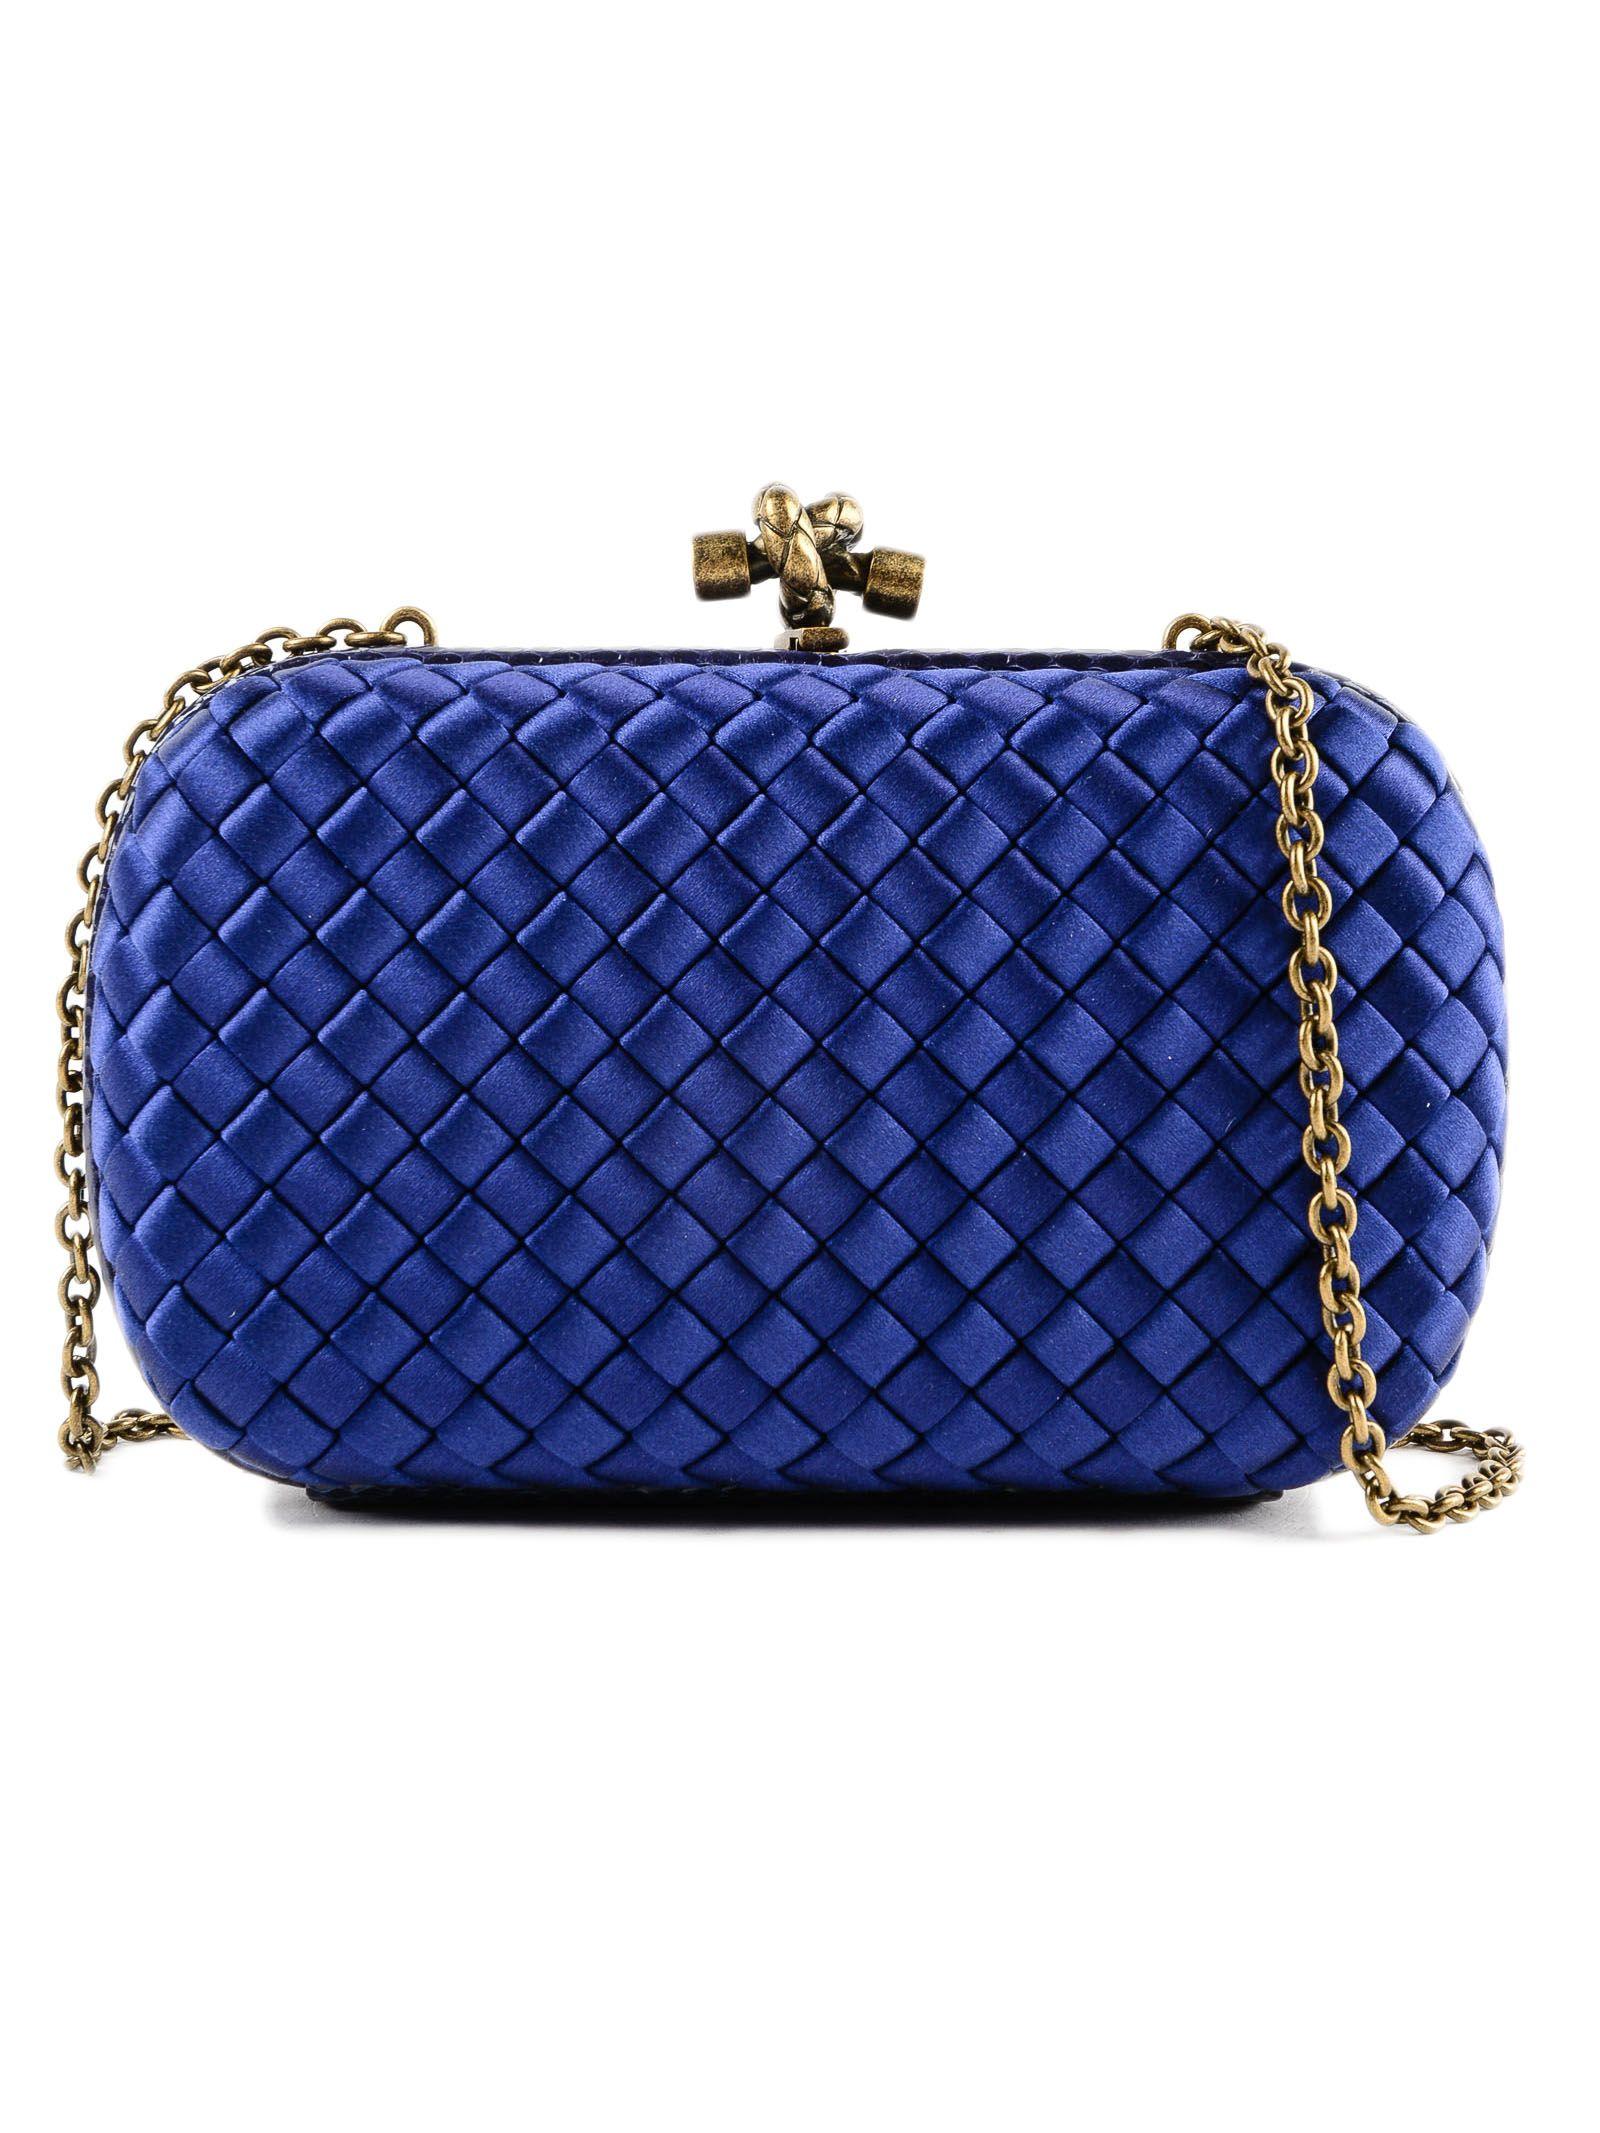 43255568fda3 Bottega Veneta Chain Knot Evening Shoulder Bag In Atlantic